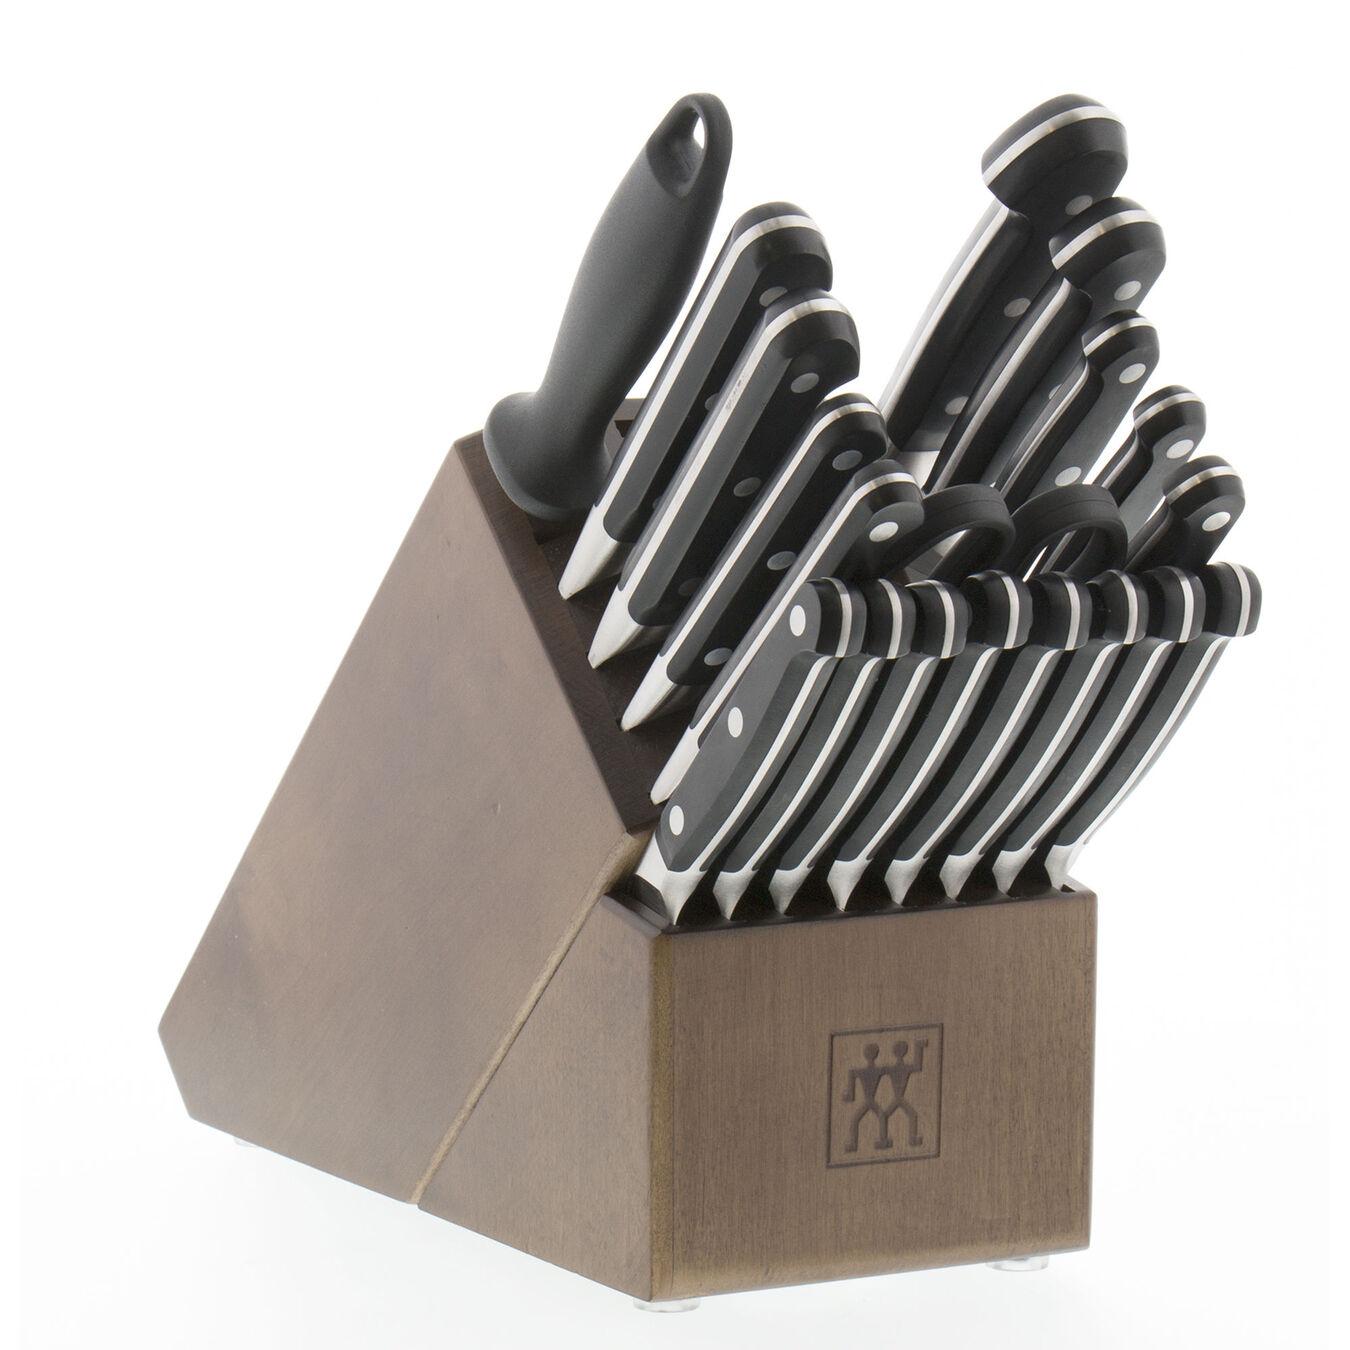 20-pc Knife Block Set,,large 1